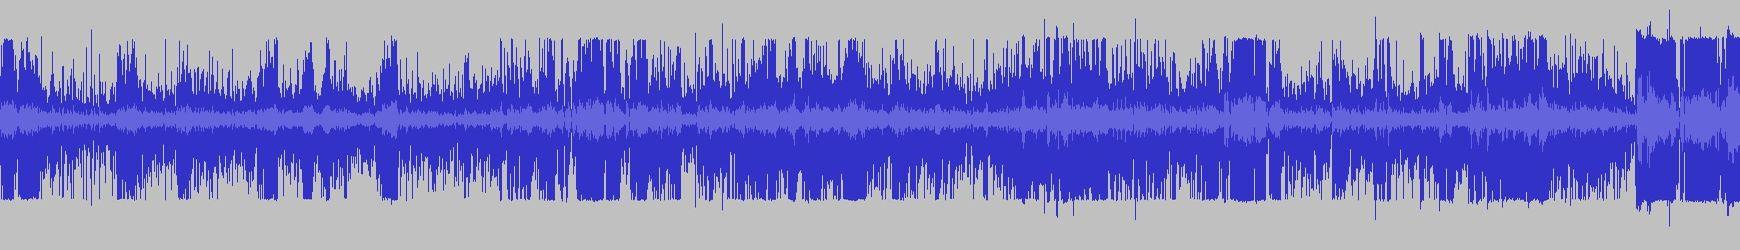 Interview-Annick-Brofman-13mars2013-radio-ici-et-maintenant-95,2FM_1